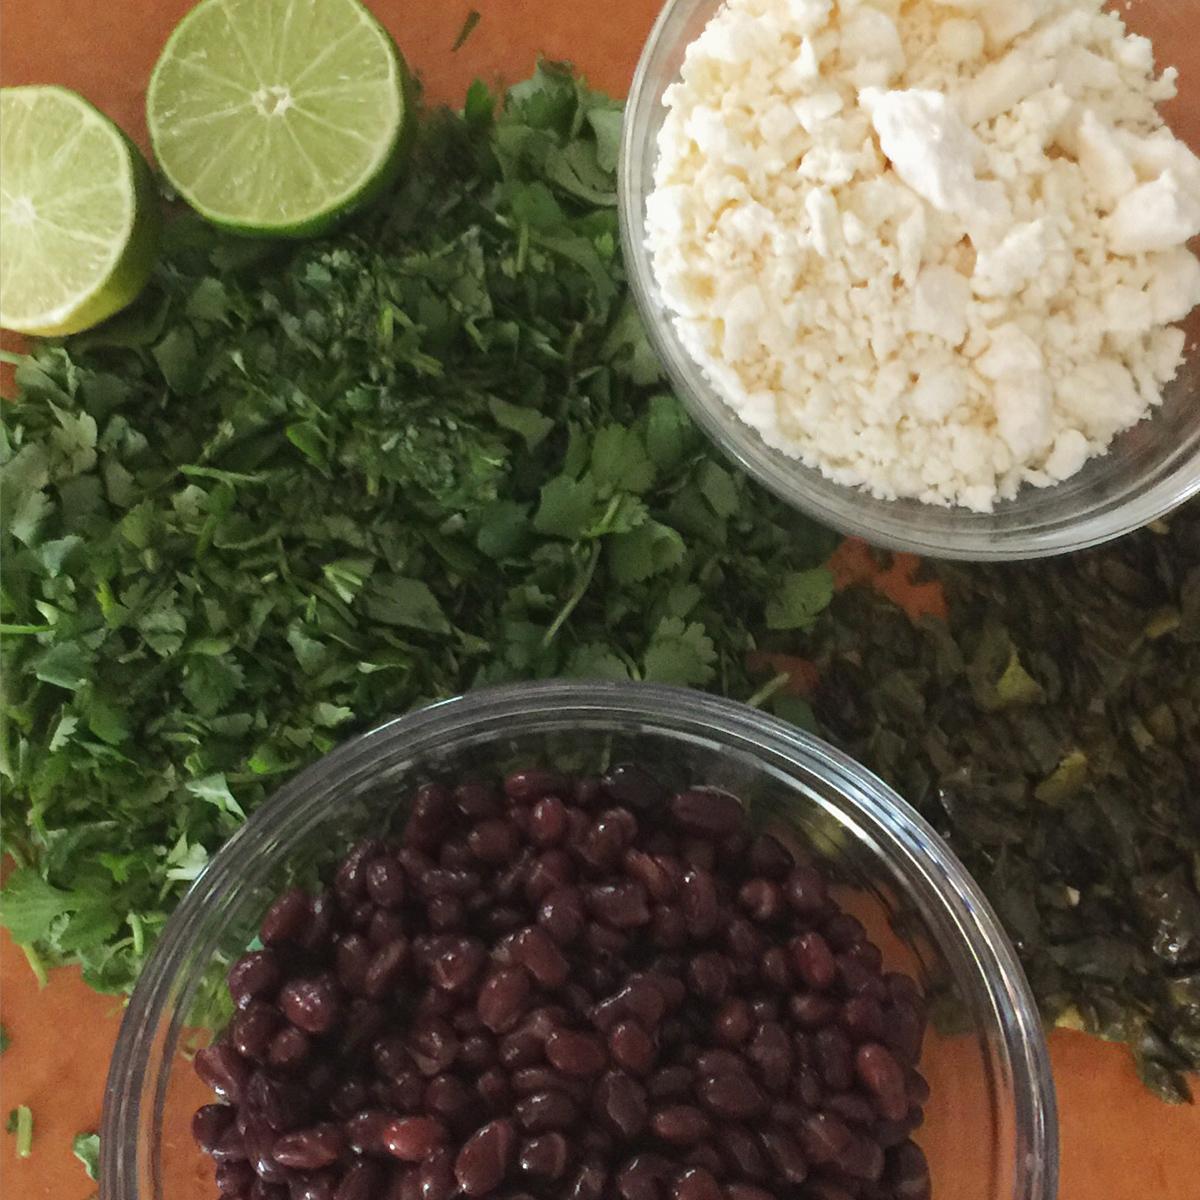 Heinen's Sunday Supper: Family Taco Nights with Shauna